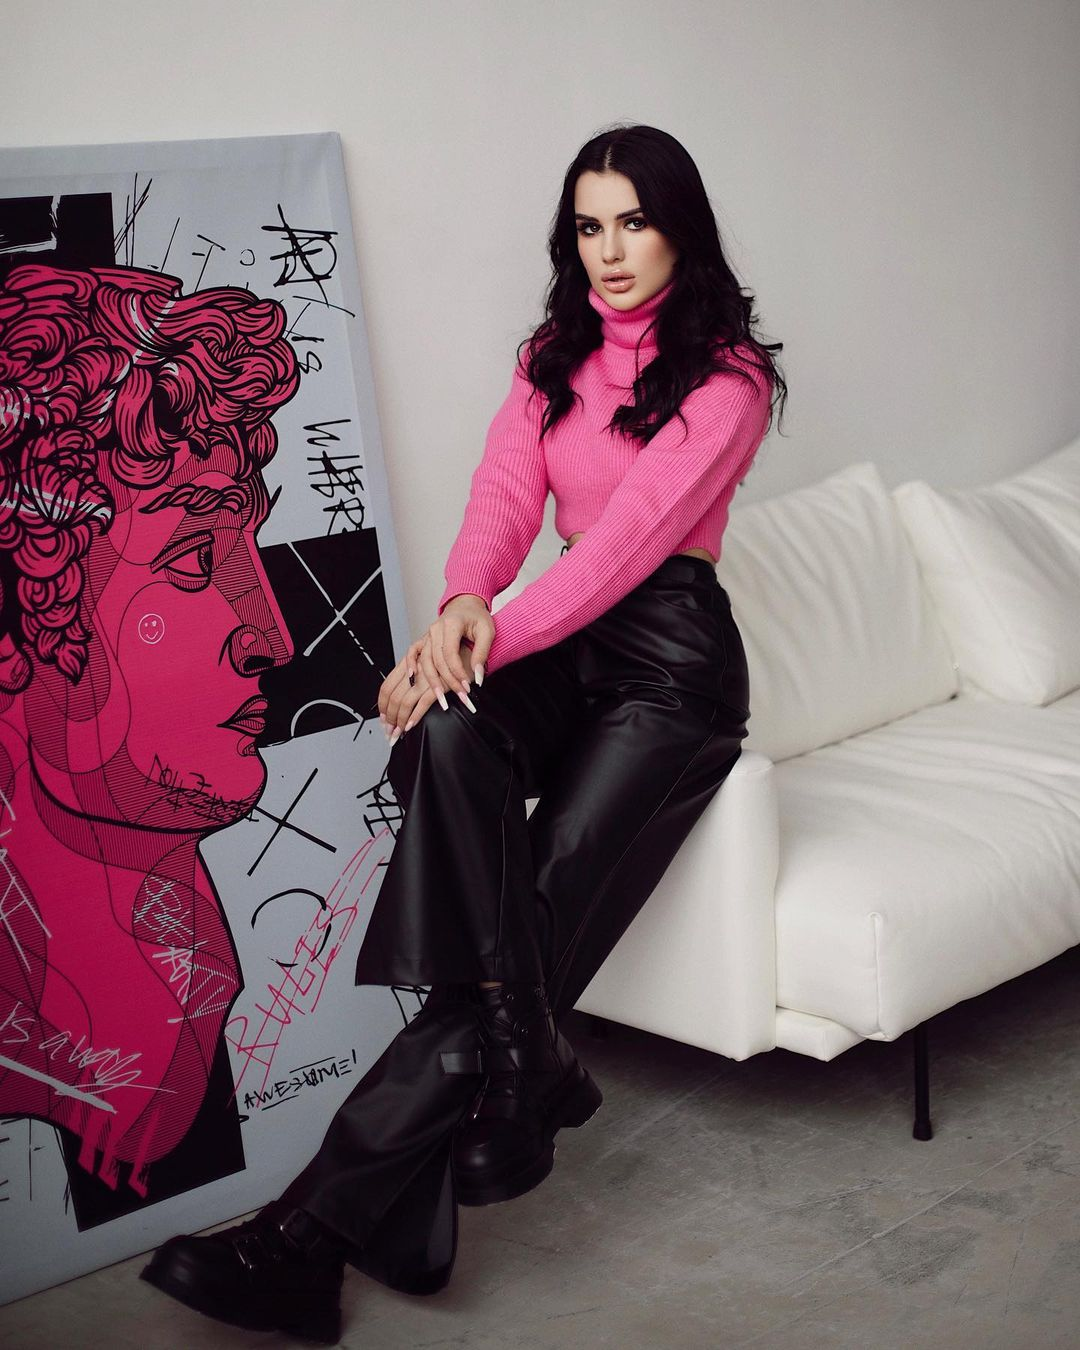 Karina-Arakelyan-Wallpapers-Insta-Fit-Bio-9